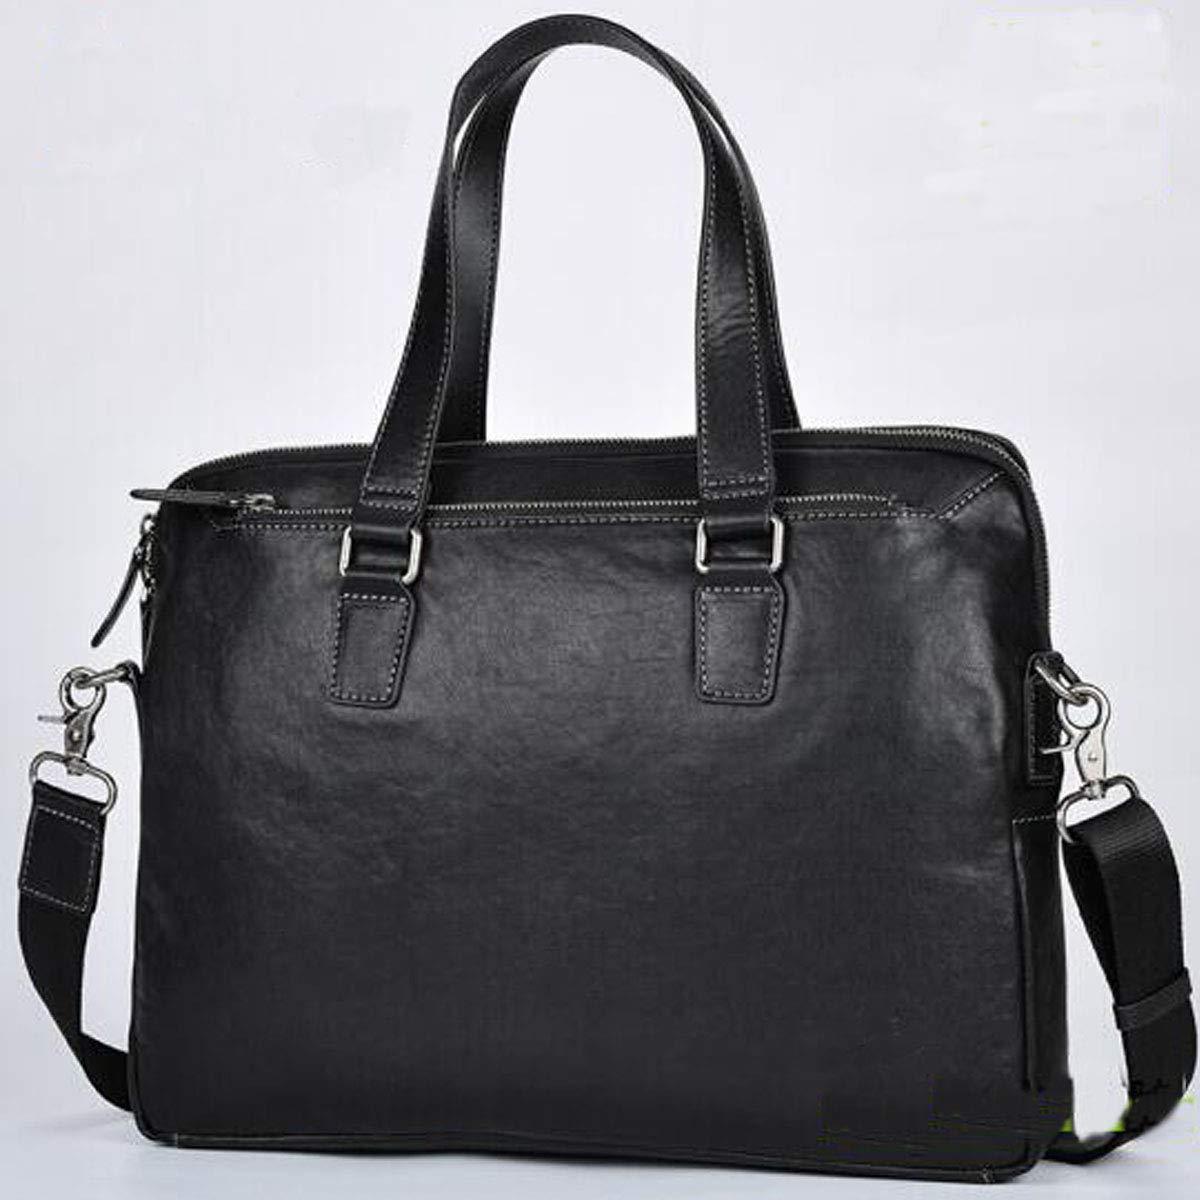 Leather Mens Handbag Lightweight Vegetable Tanned Leather Color : Black 8haowenju Briefcase Black /· Size: 38 9 29.5cm Large-Capacity Backpack Business Computer Bag